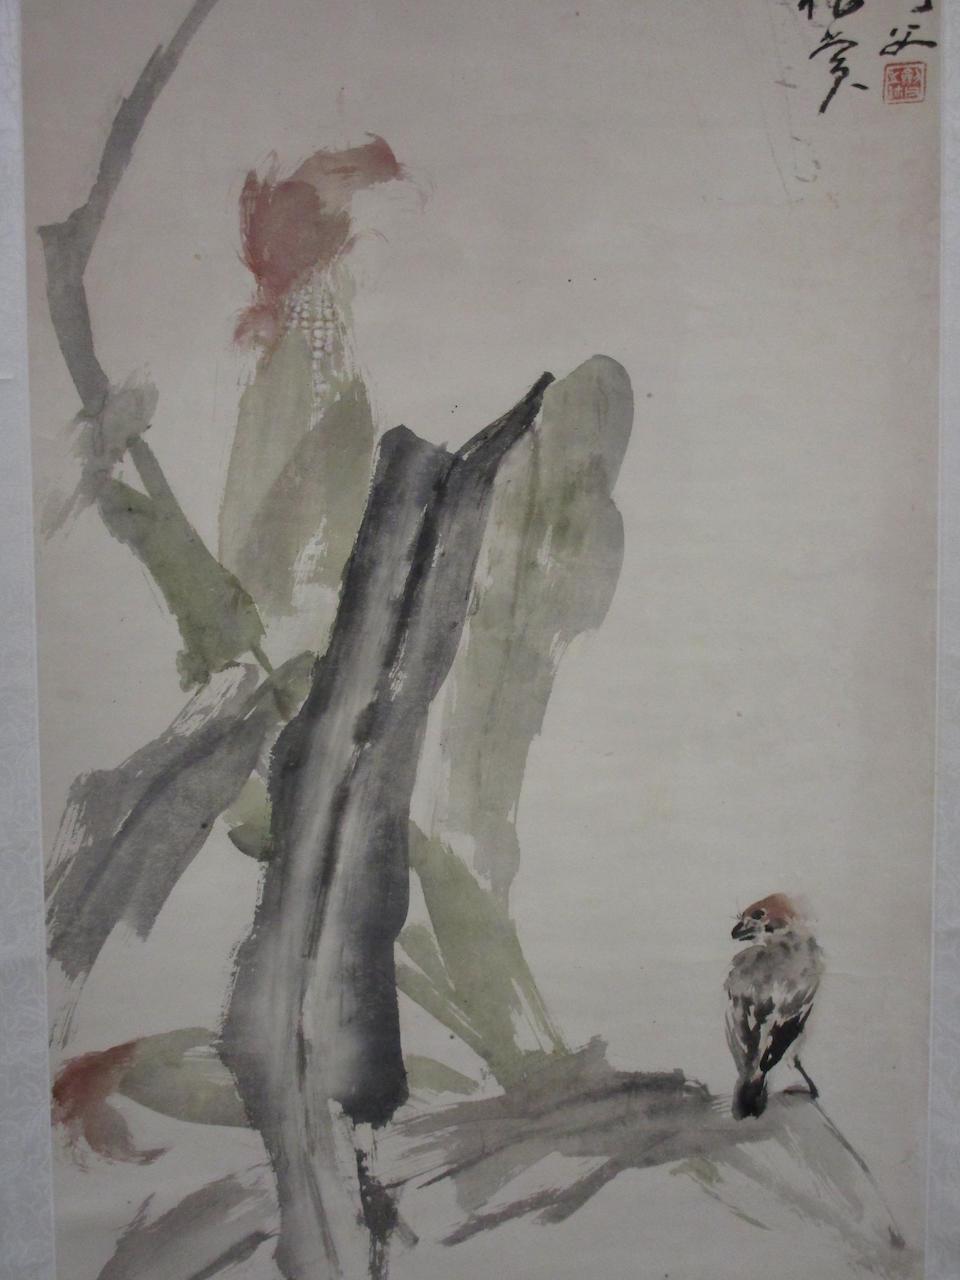 Gao Jianfu (1879-1951) Sparrow on Maize Stalk, 1940